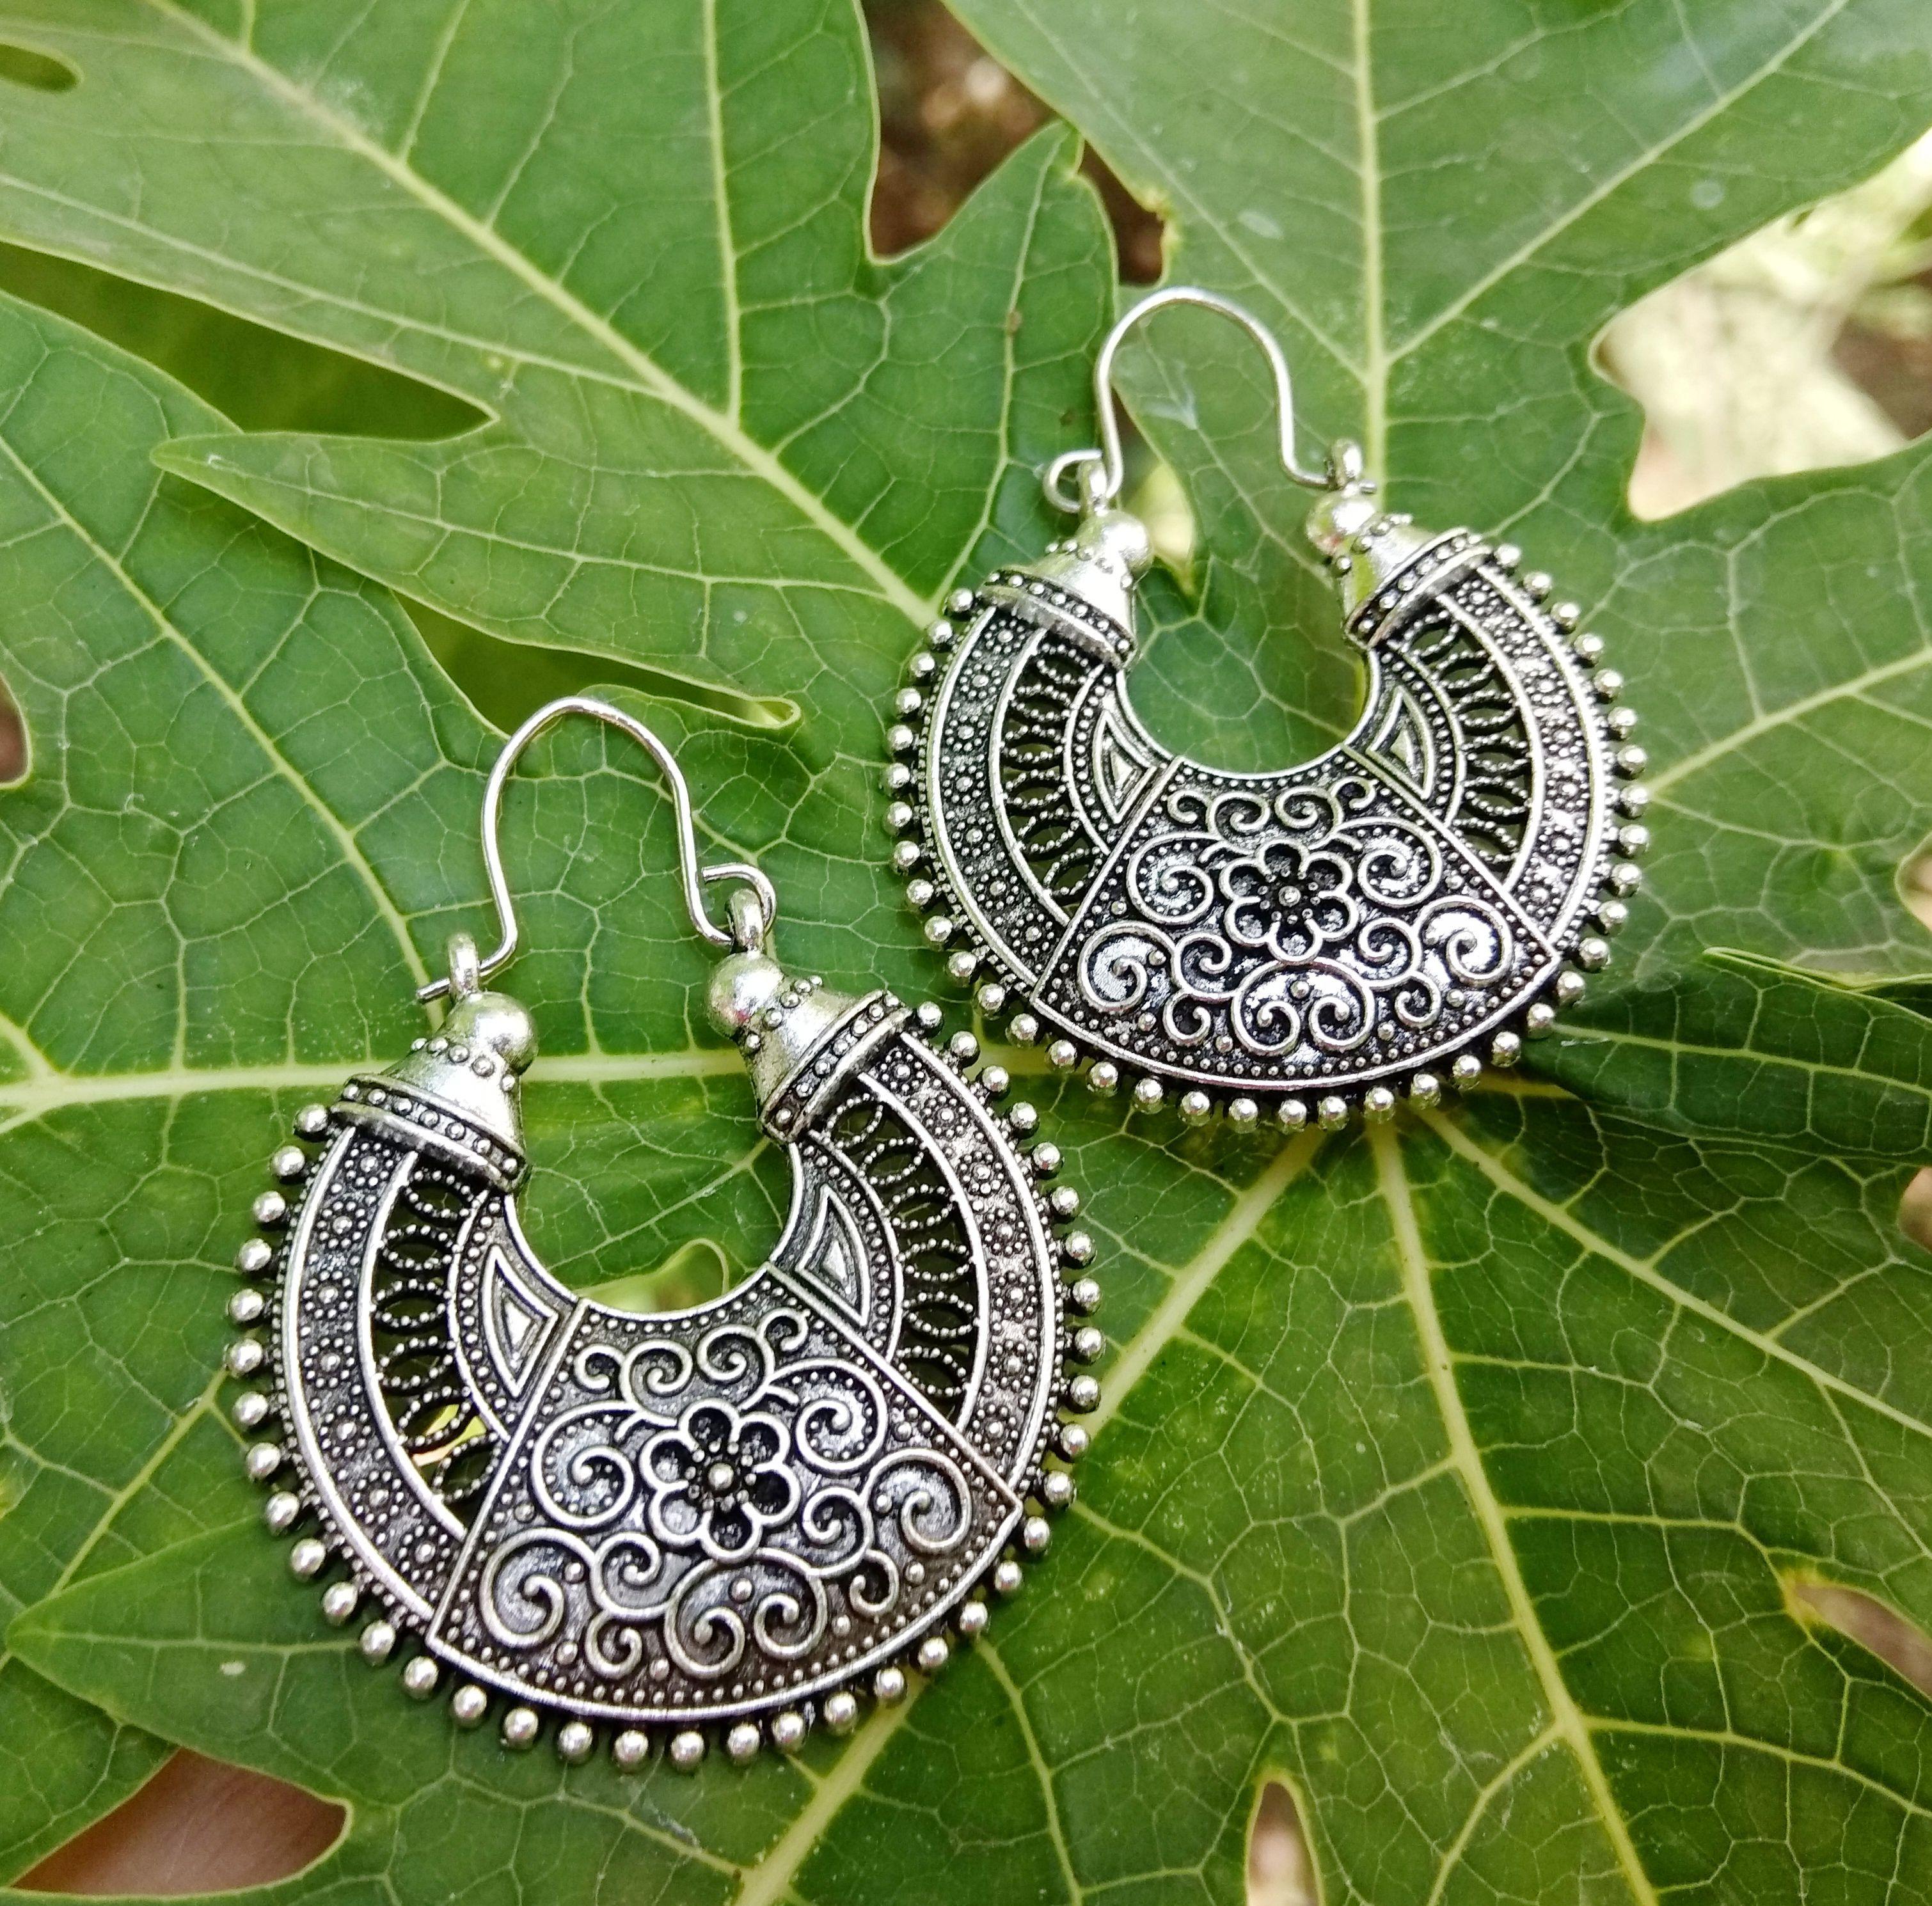 8d78c7bfd Large ethnic antique silver earrings, Indian tribal hoop earrings, Bohemian  dangle earrings, Engraved boho hippie, Vintage style earrings.